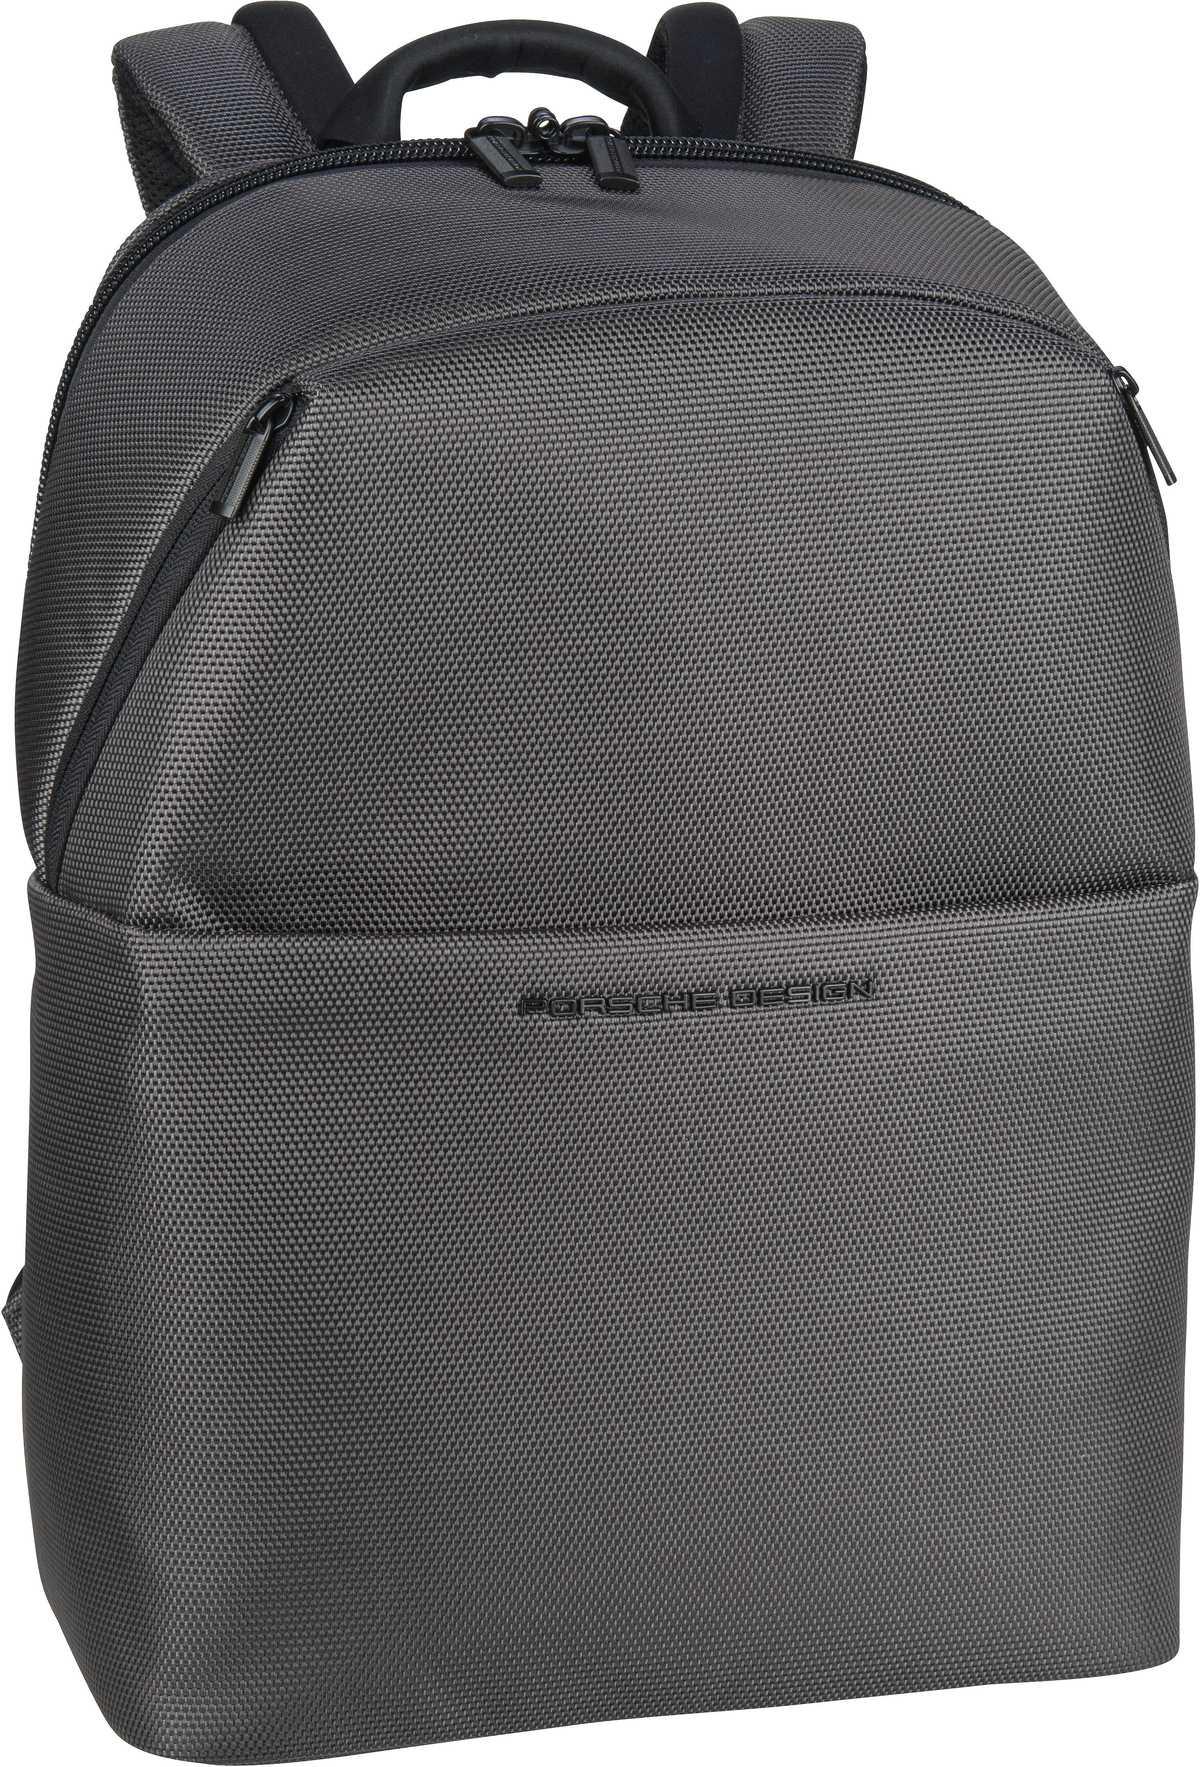 Rucksack / Daypack Roadster 4.1 BackPack MVZ Grey